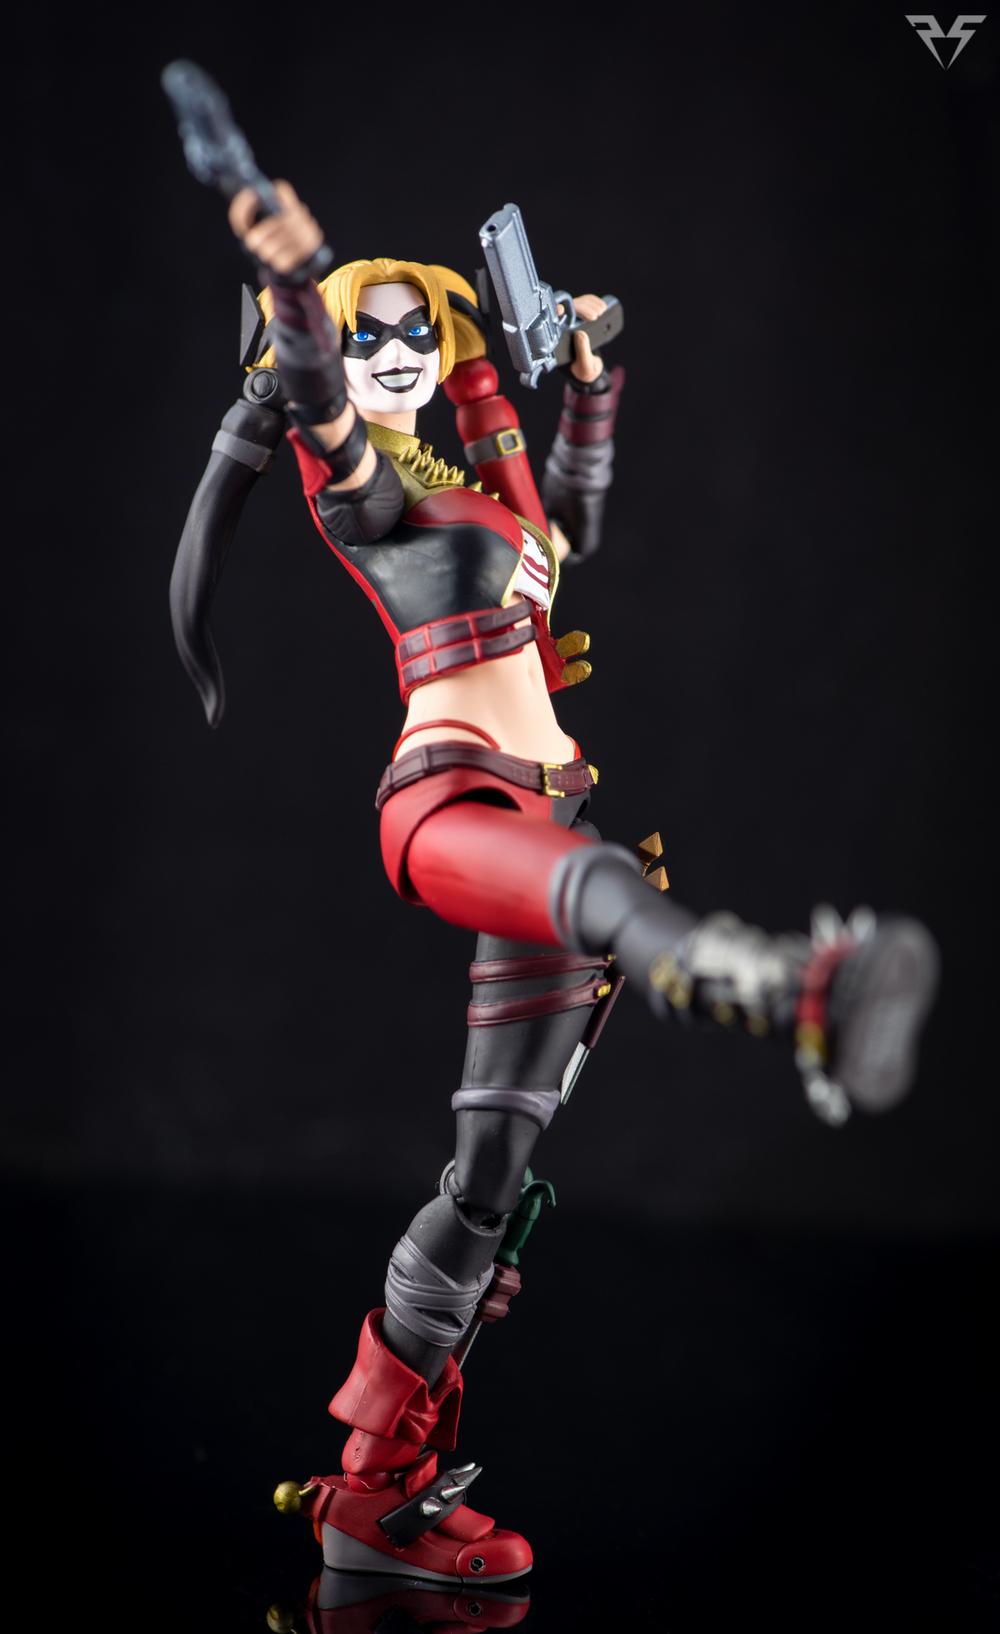 Figuarts Harley Quinn-6.jpg